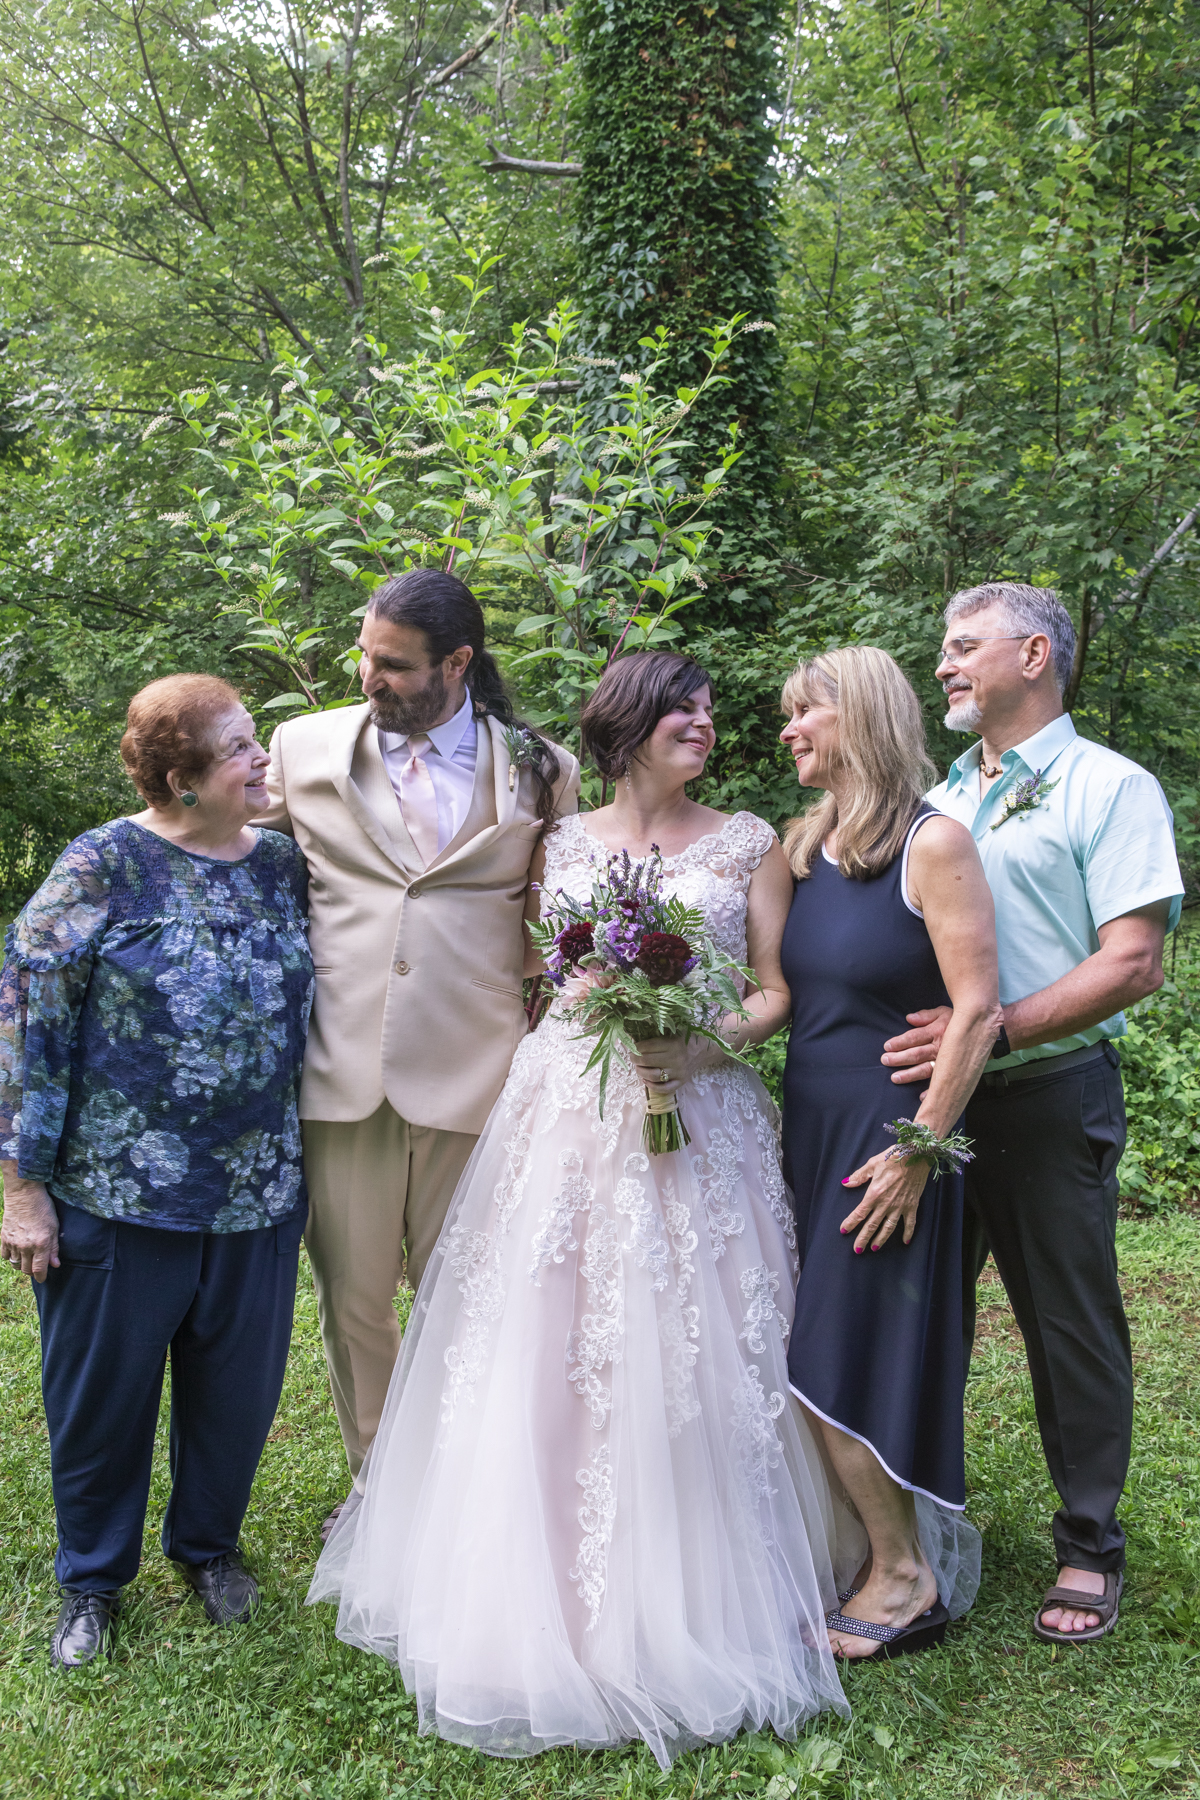 Avyanna and Phoenix Wedding 2019_photos by Studio Misha_BLOG-117.jpg